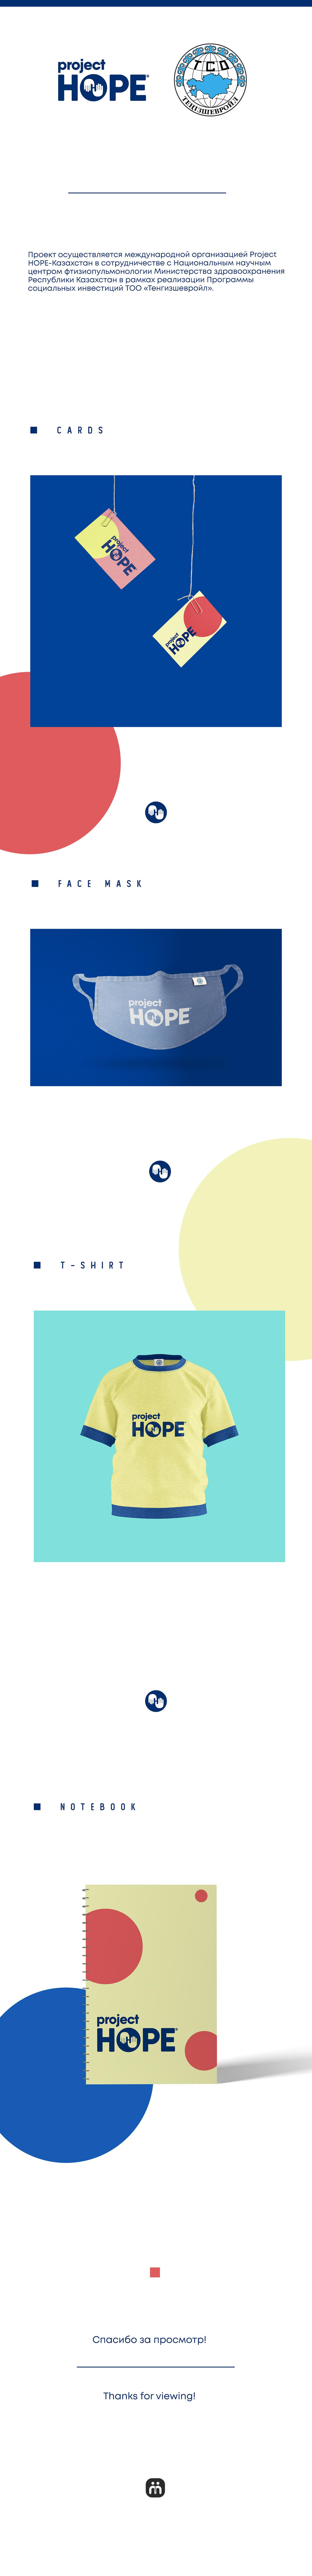 design mojet agency projecthope